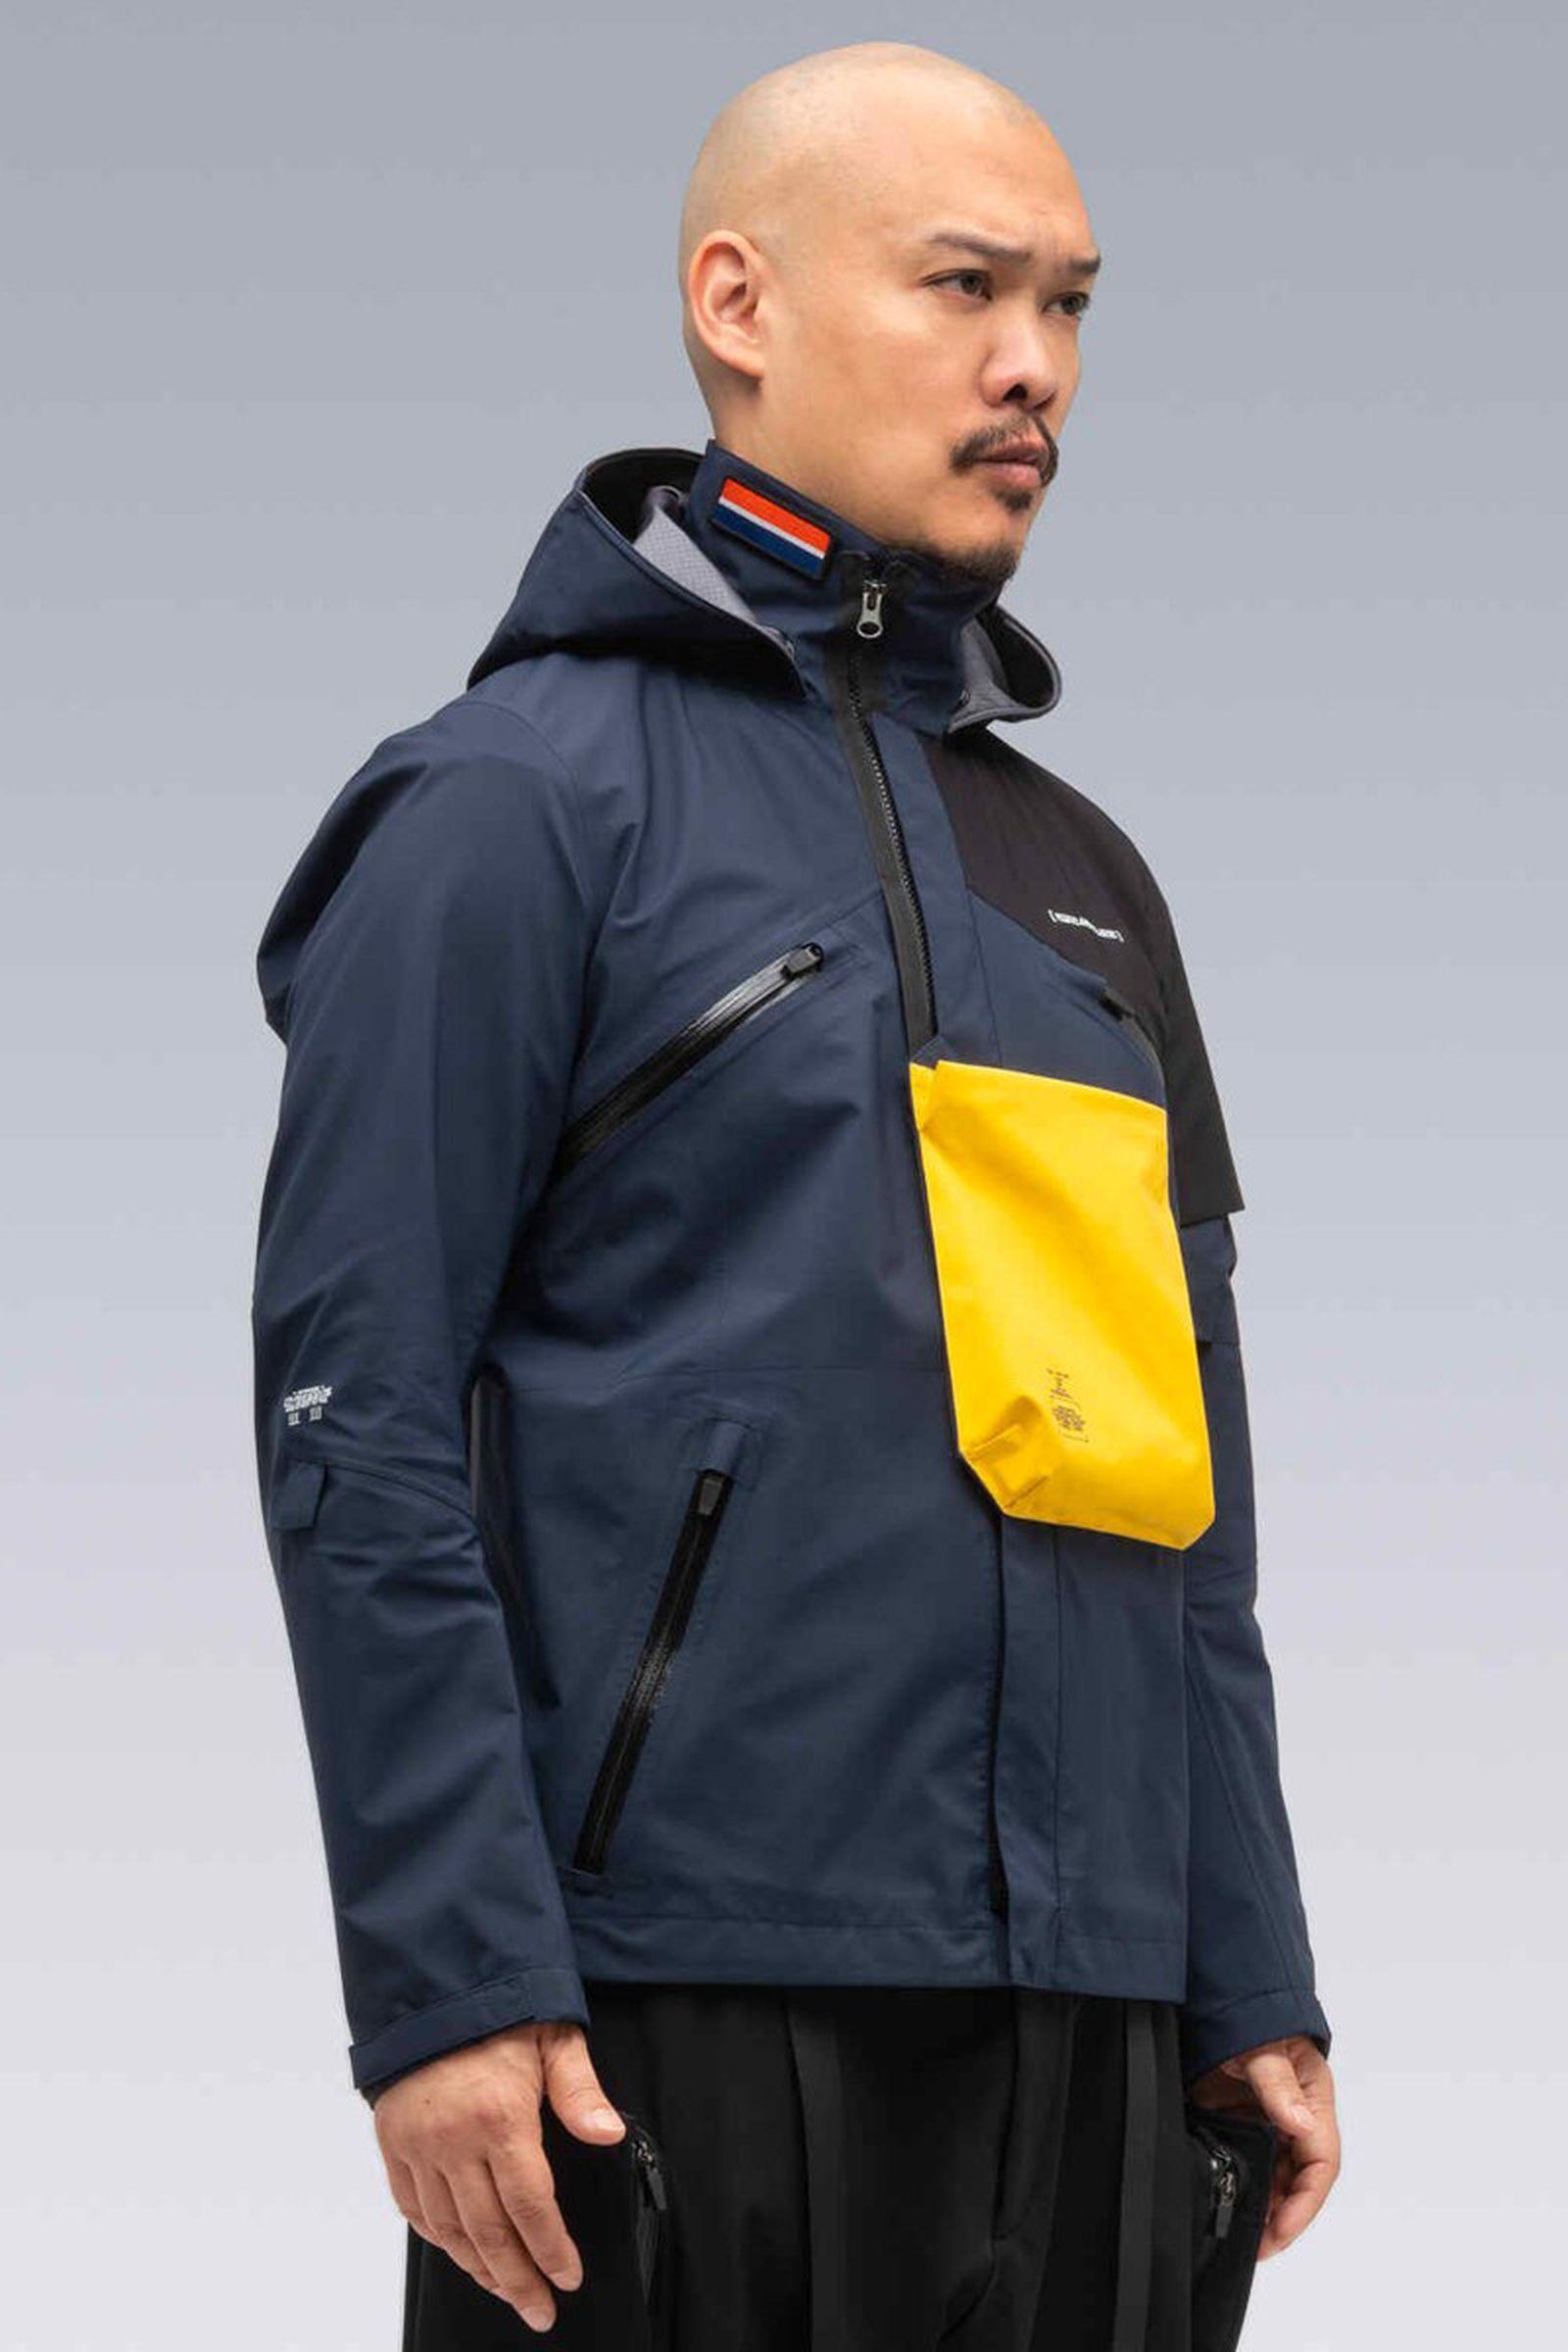 ACRONYM 'Death Stranding' J1A-GT Jacket